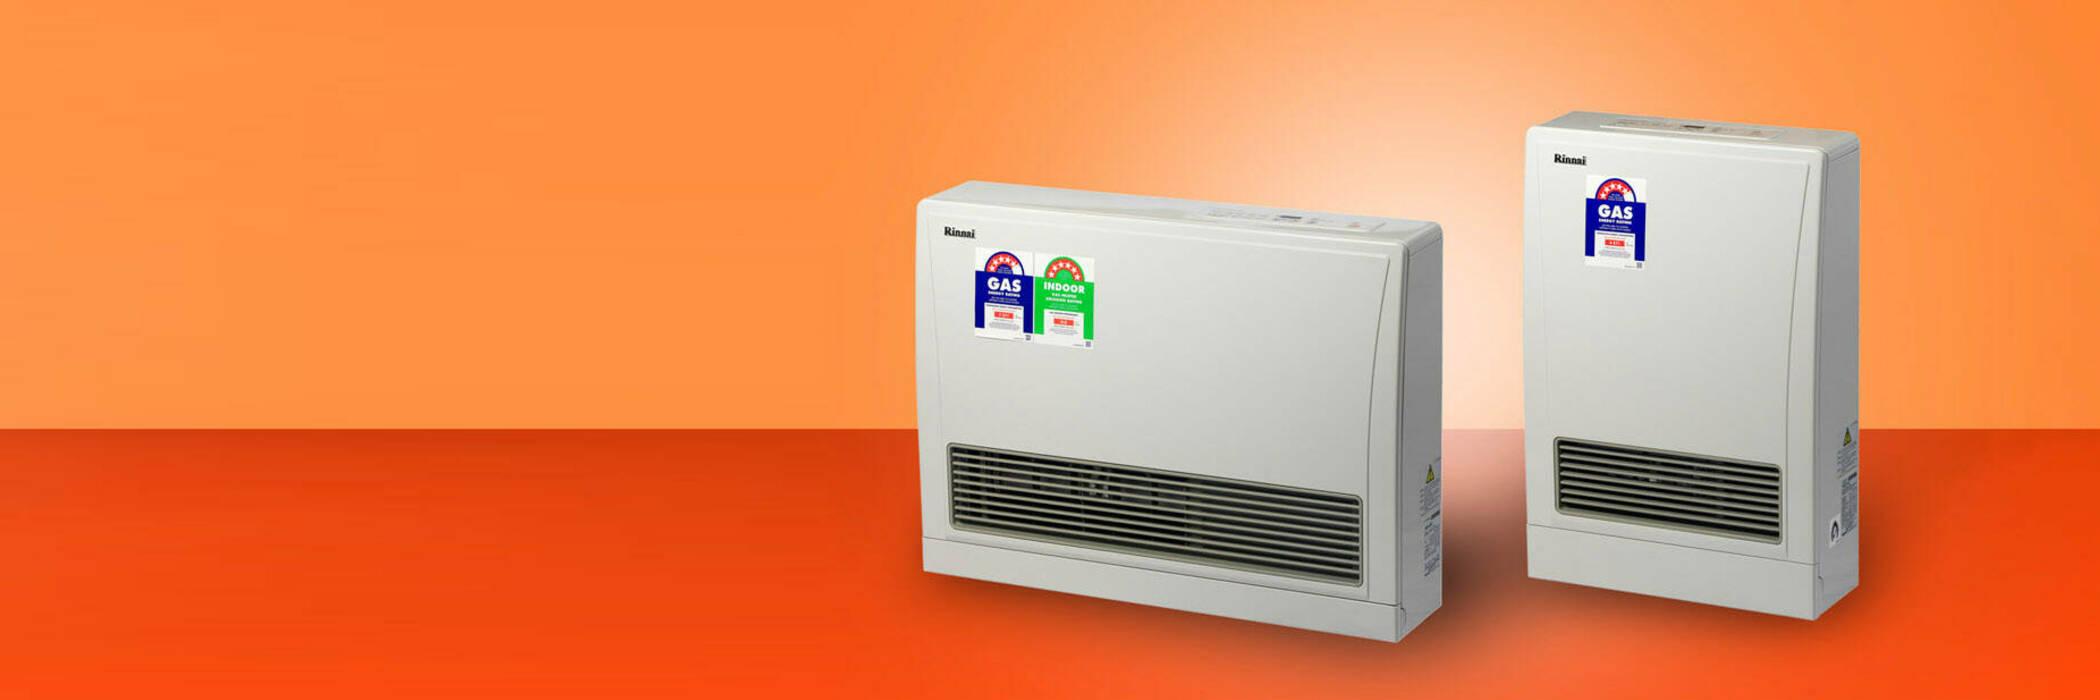 Rinnai Energysaver 559FT and Energysaver 309FT flued gas heaters.